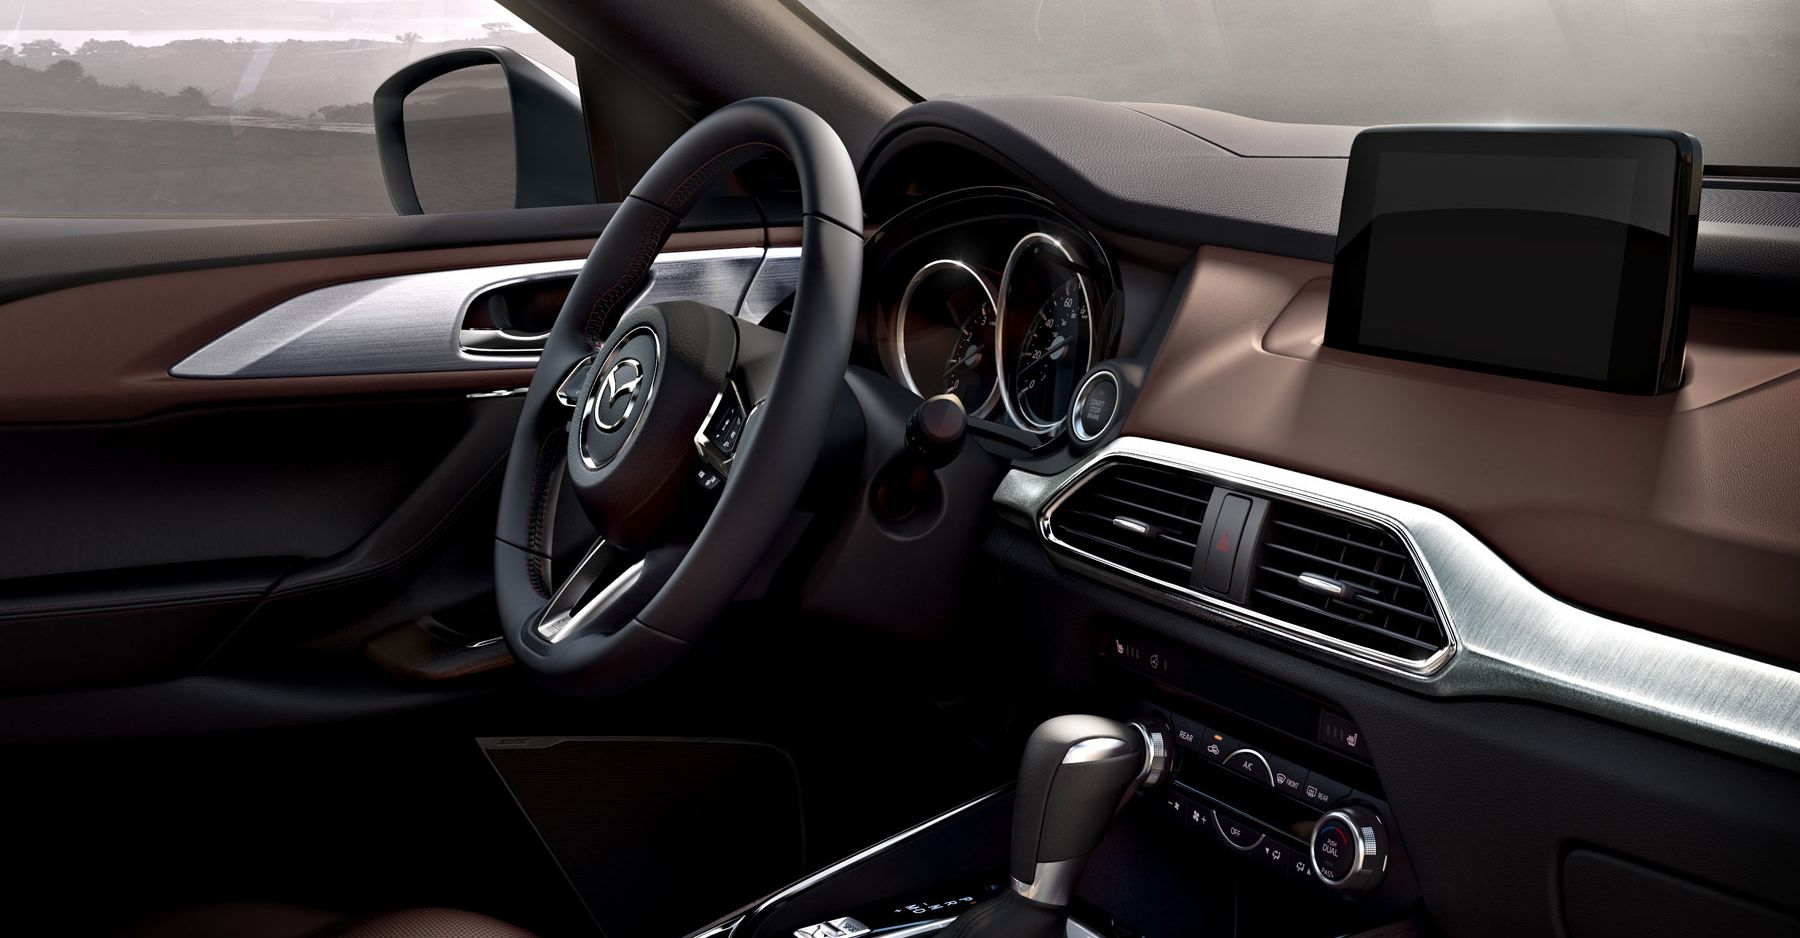 Mazda Cx9 Fuse Box Location Ecotec 3 Engine Diagram Home Ethernet Cx 9 Interior Images Best Accessories 2017 1167211